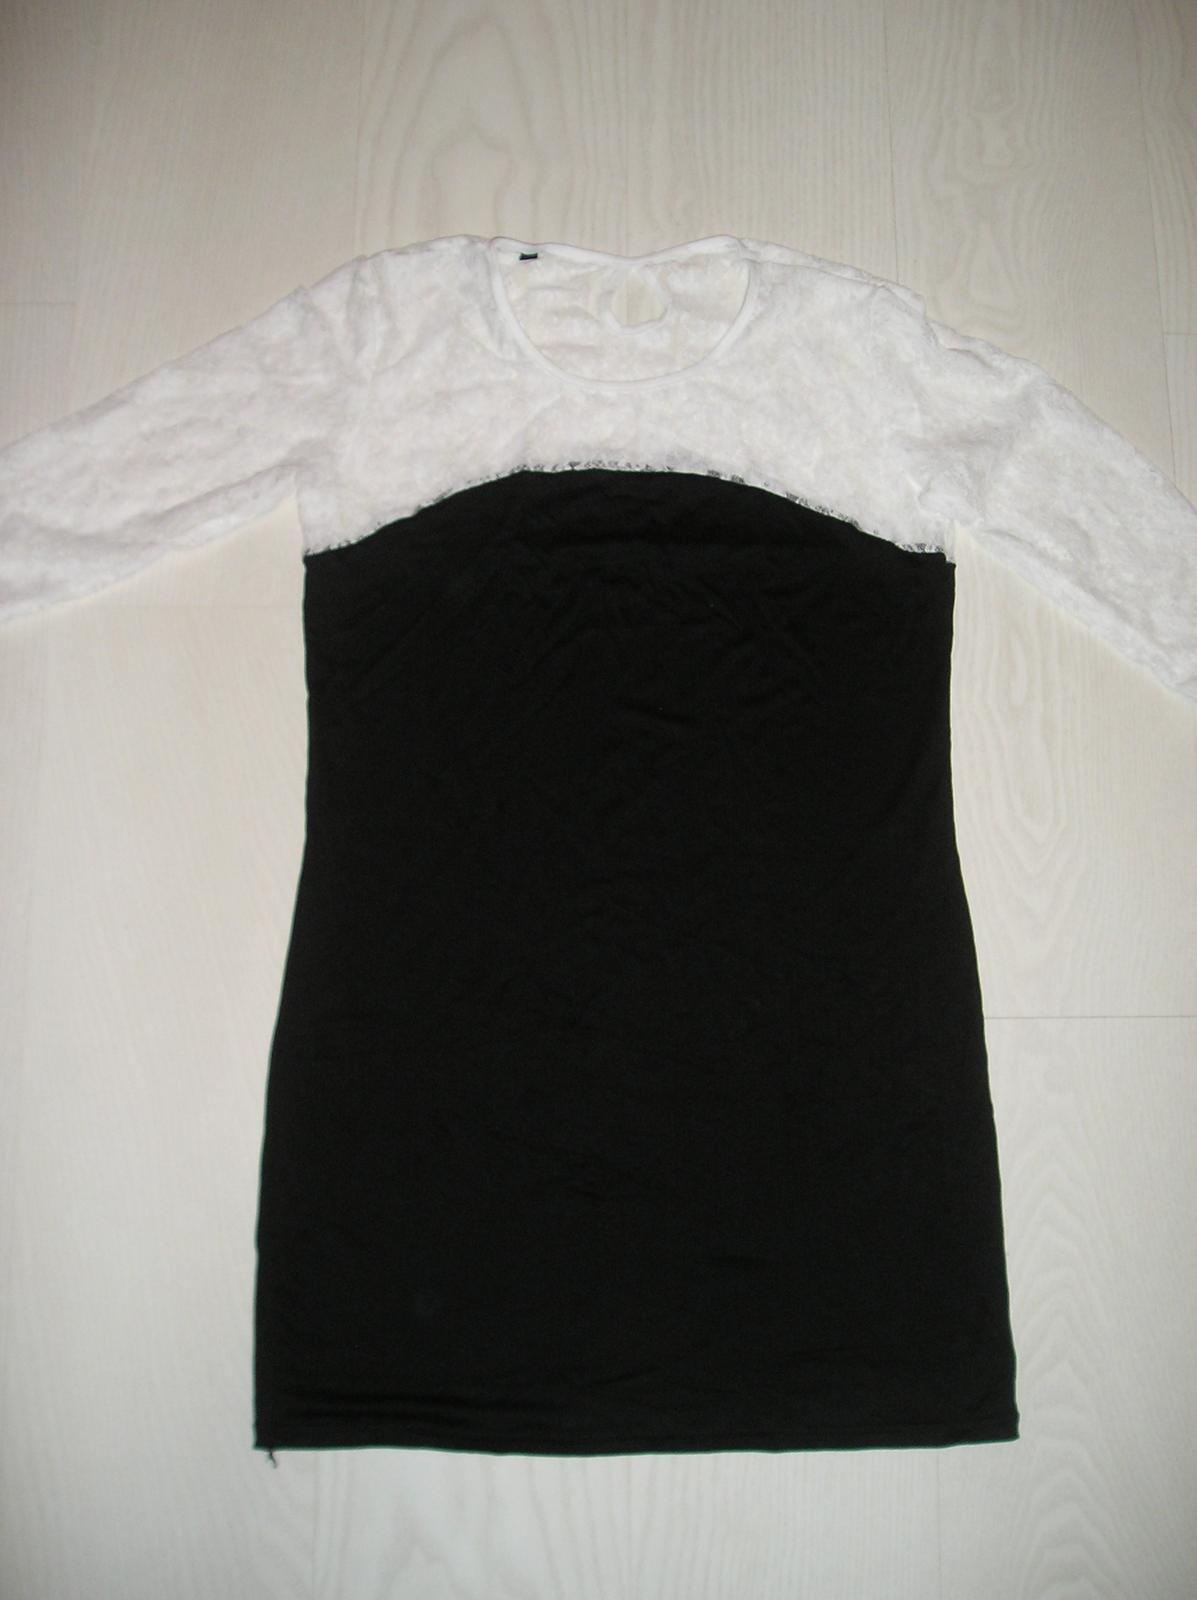 Čierna tunika s bielou krajkou  - Obrázok č. 1